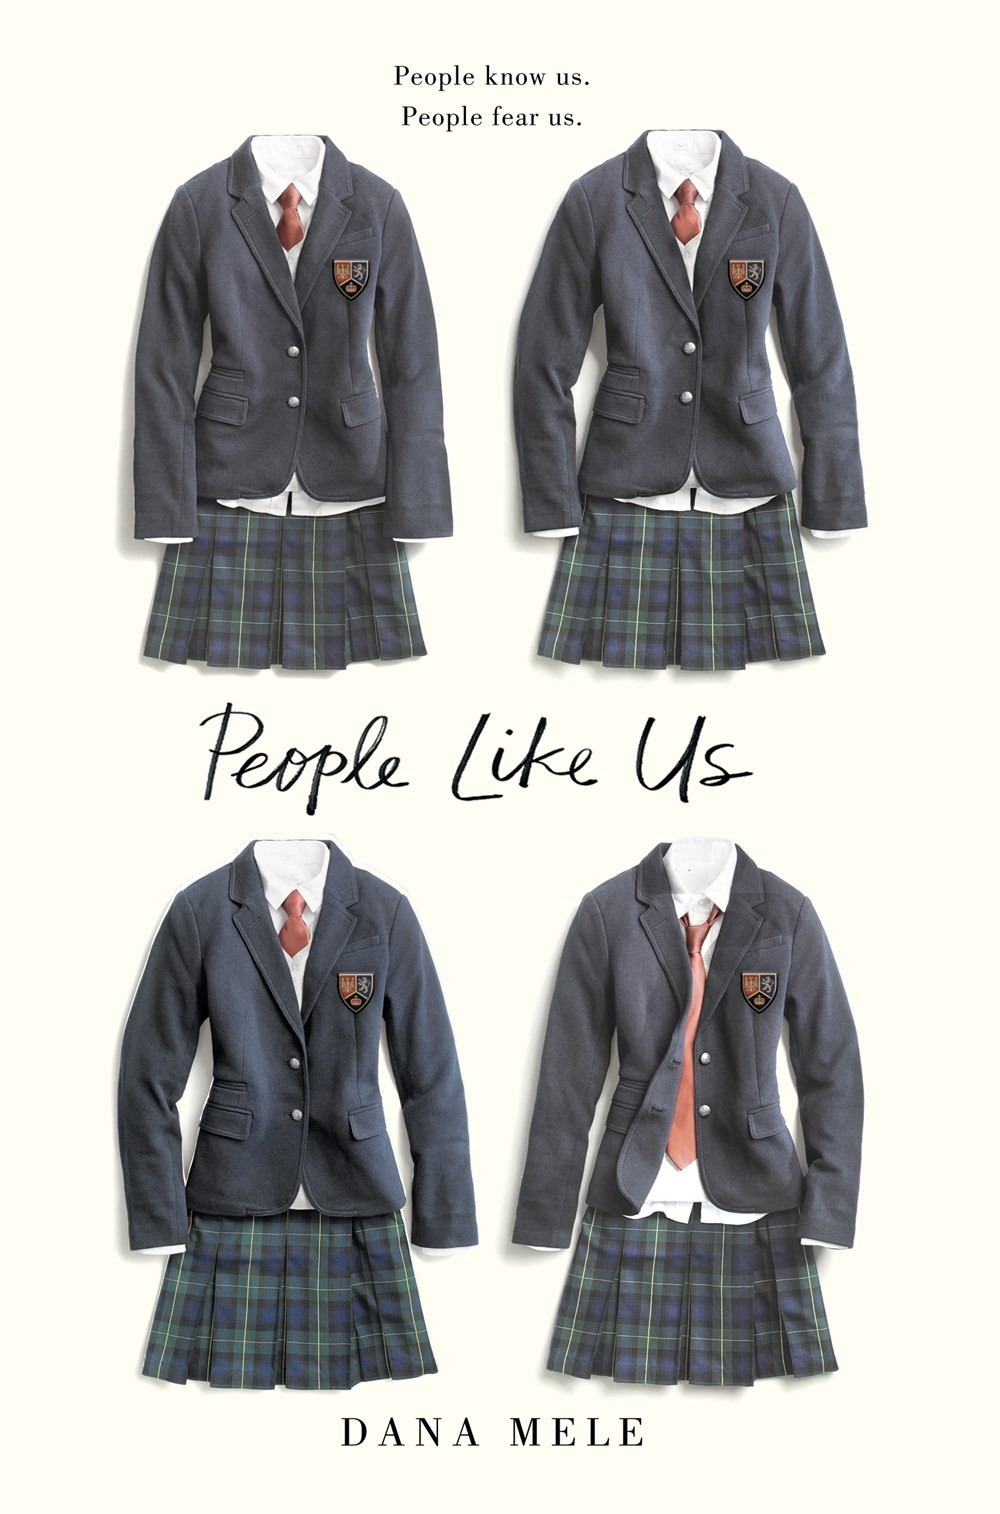 Dana Mele - People Like Us